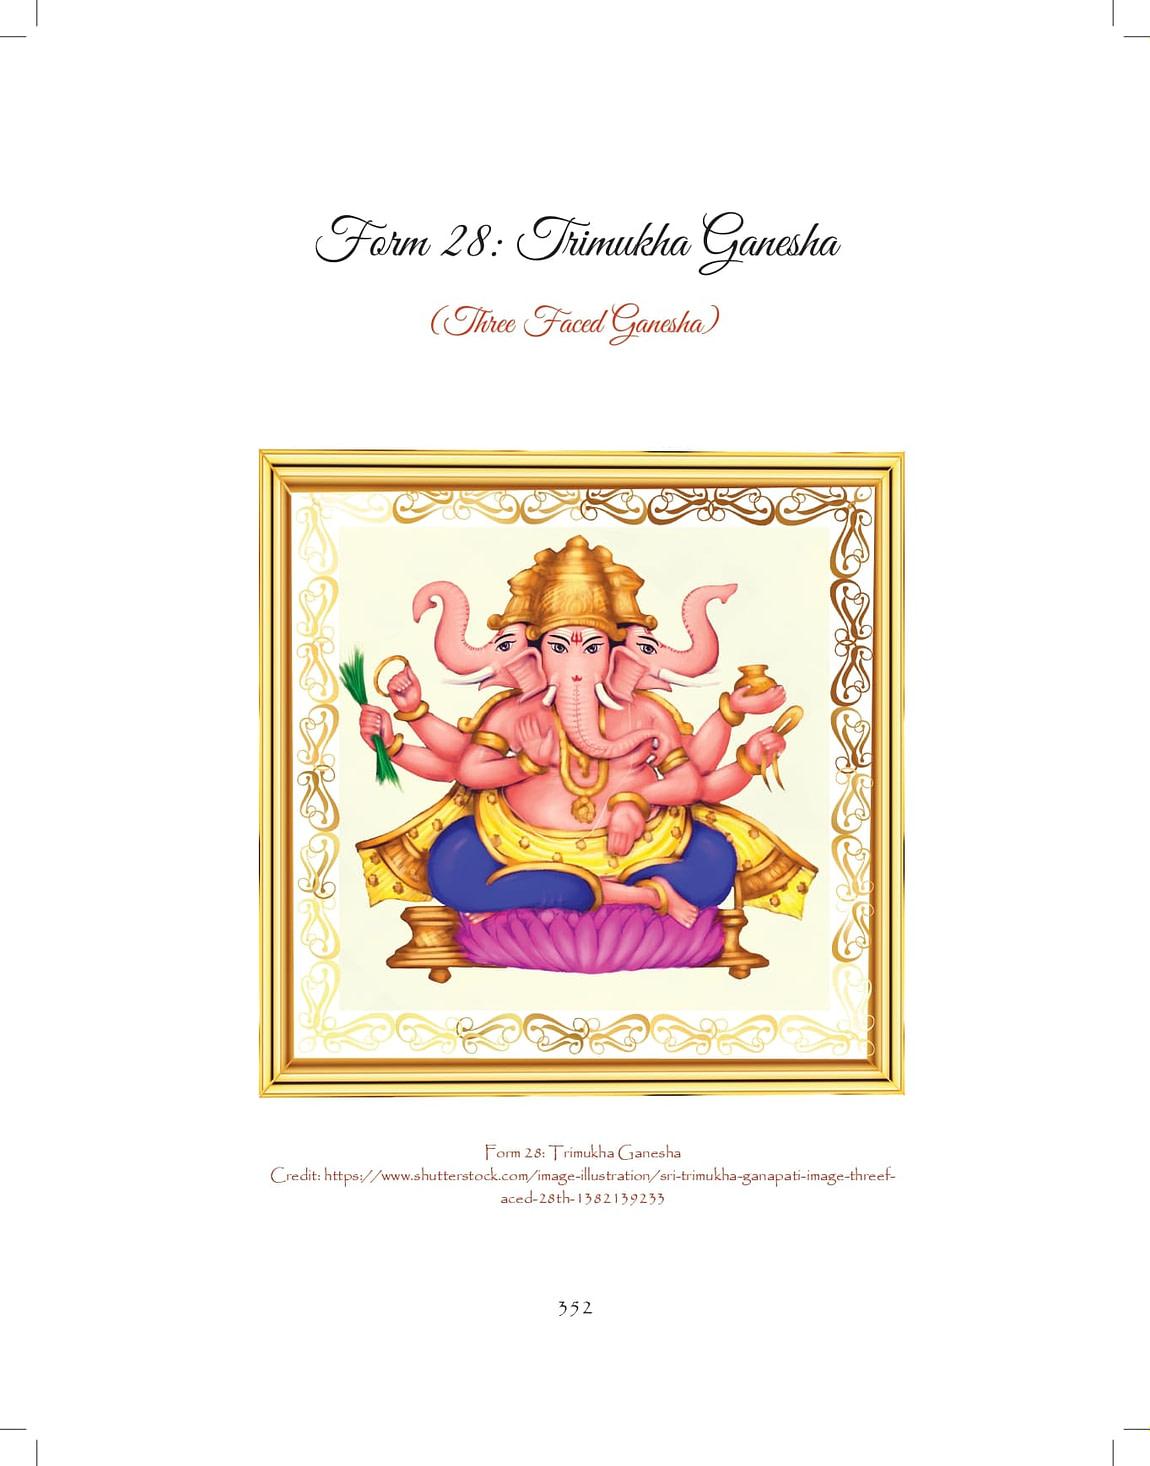 Ganesh-print_pages-to-jpg-0352.jpg